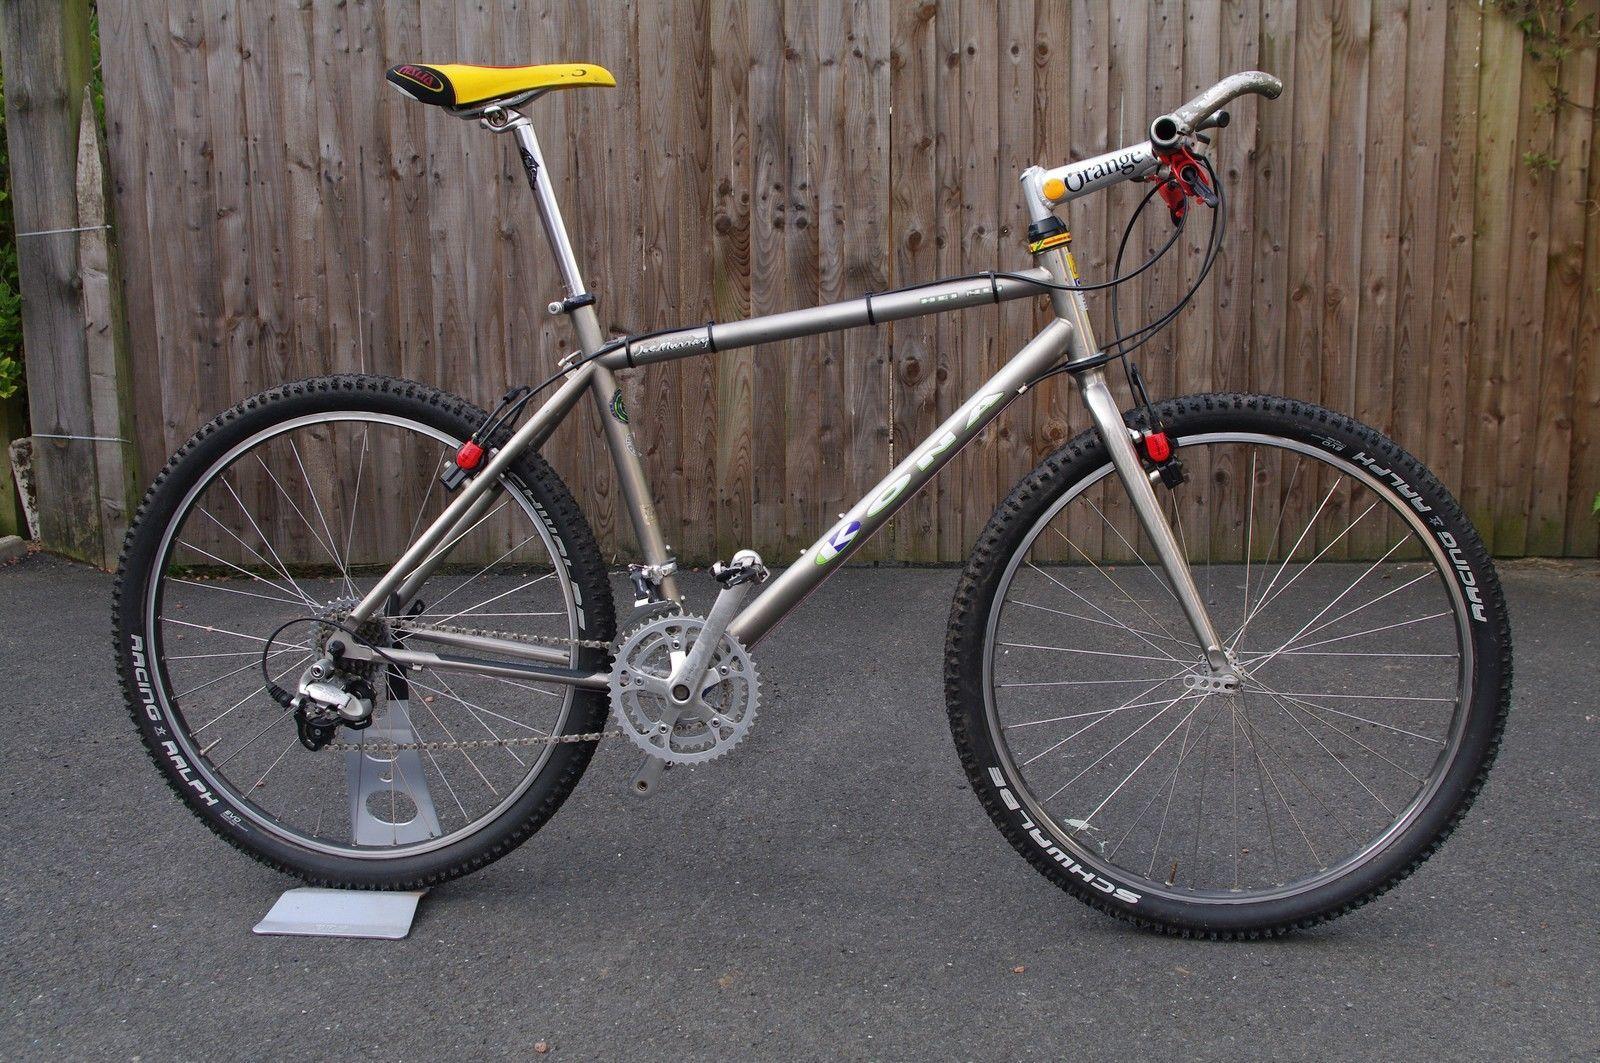 Early 1990 S Kona Hei Hei Vintage Mountain Bike 19 Vintage